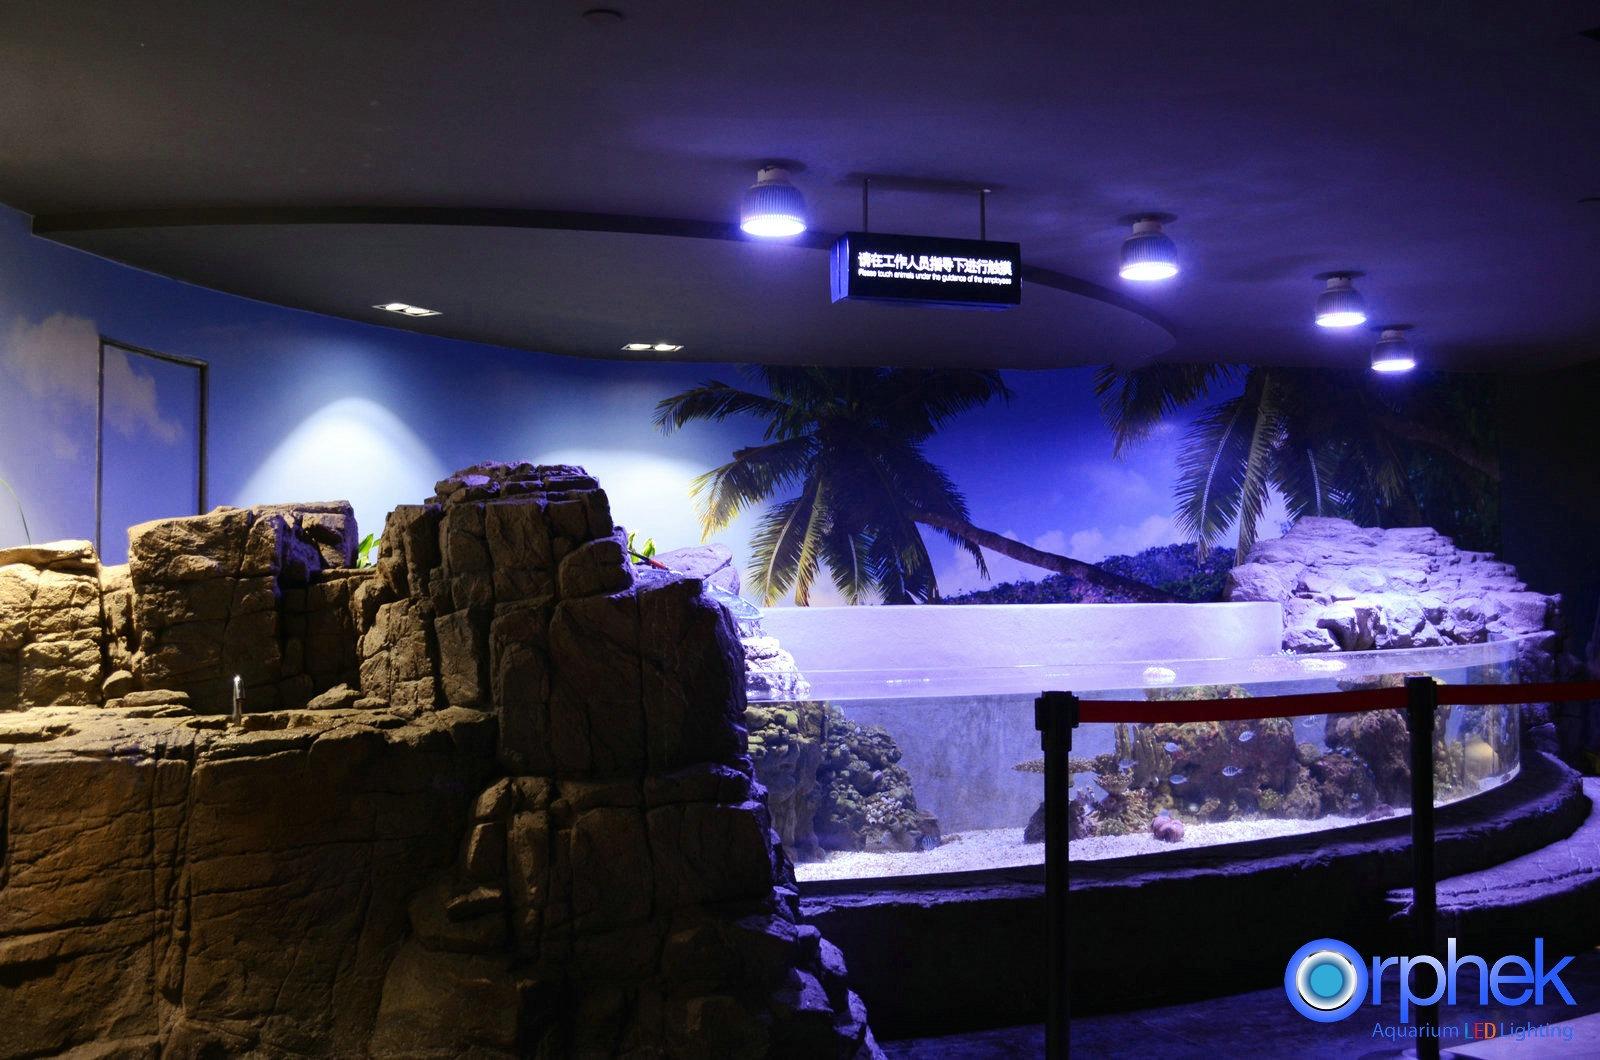 More Photos From Chengdu Public Aquarium Light by Orphek Atlantik